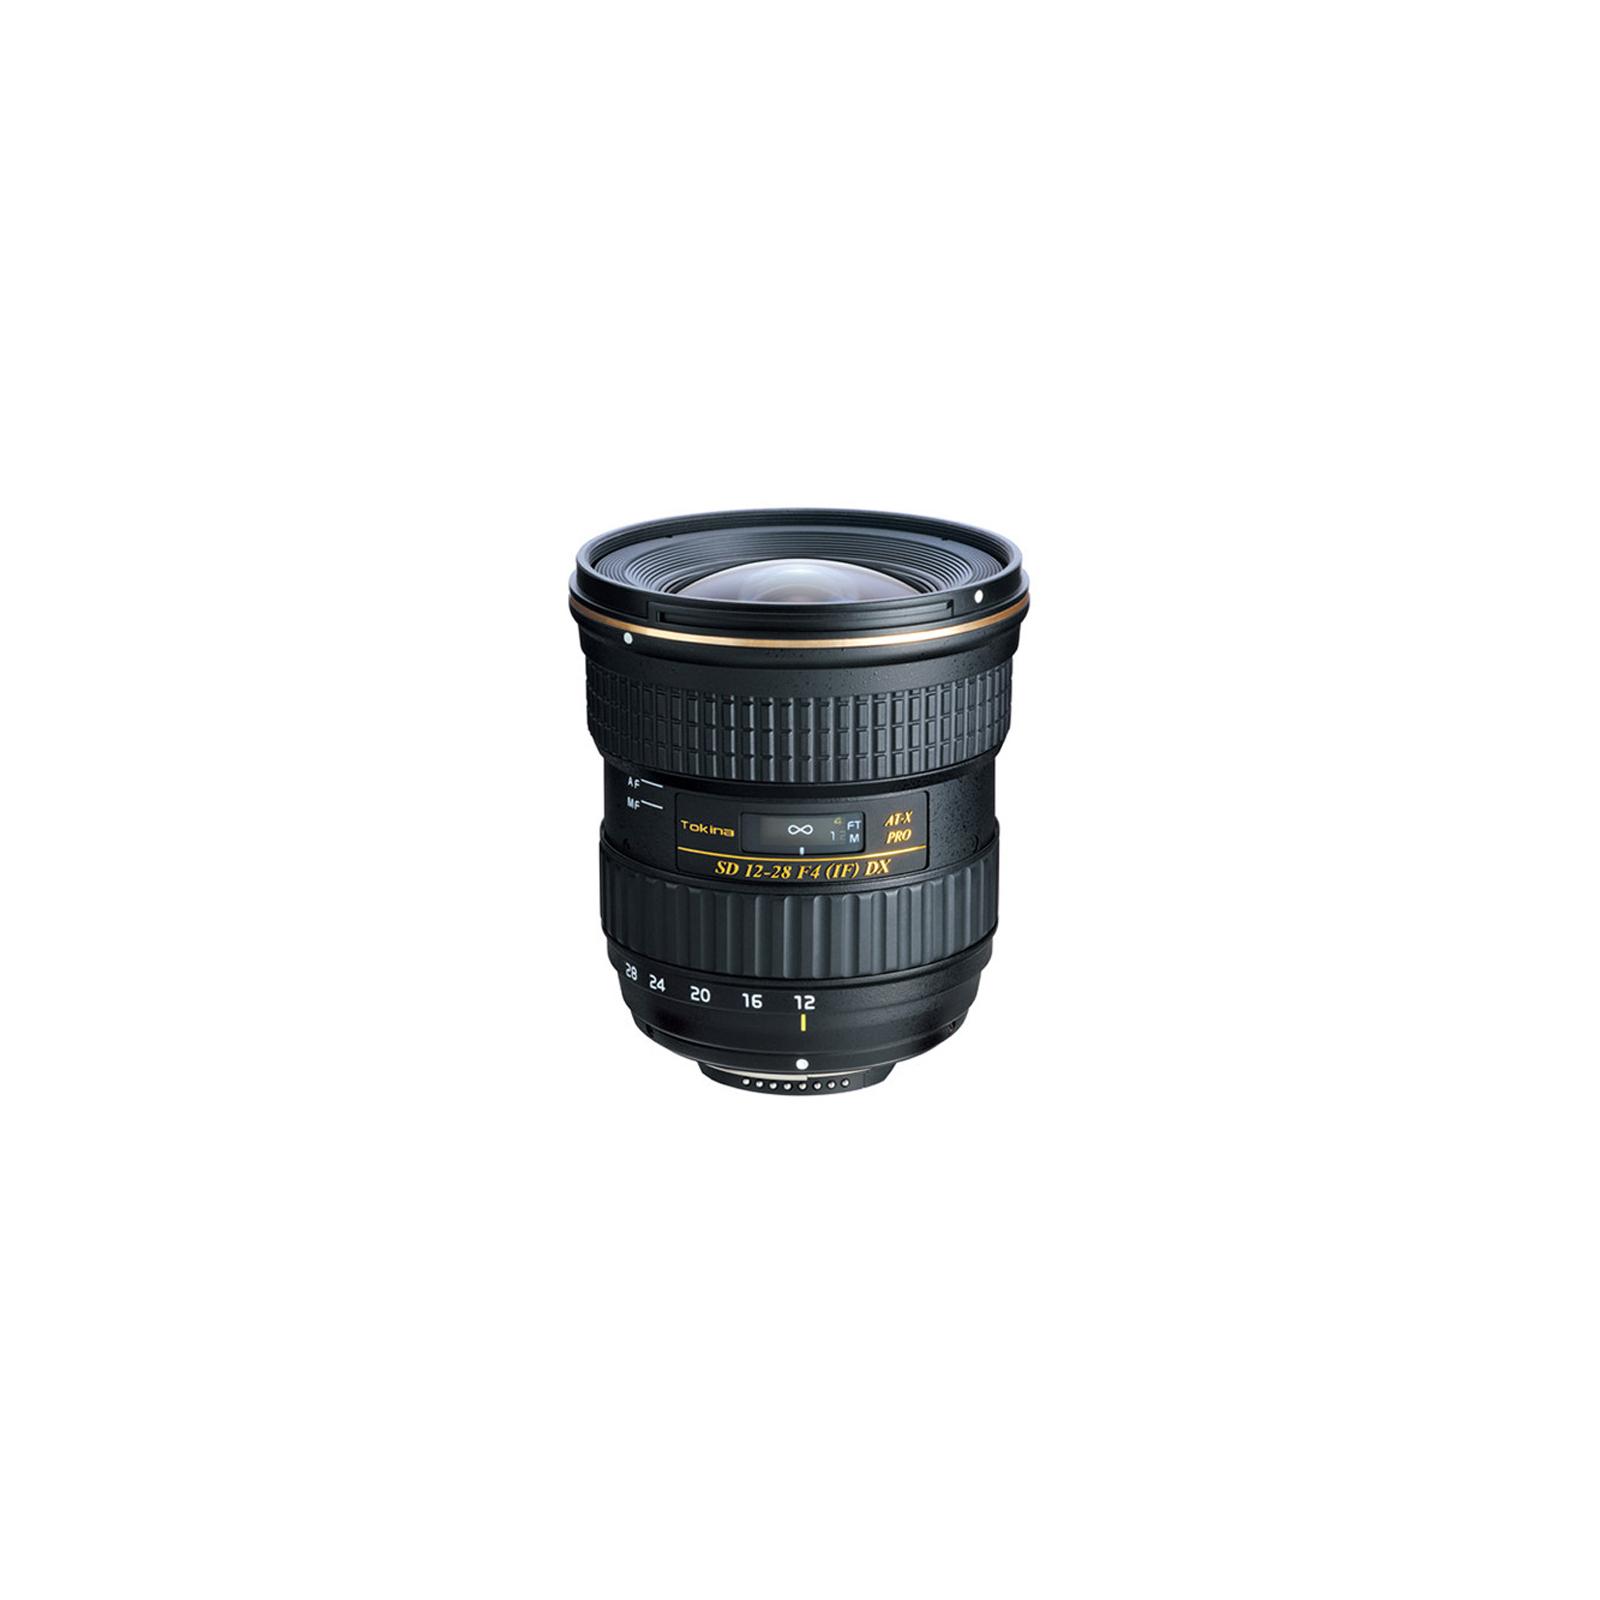 Объектив Tokina AT-X PRO DX 12-28mm f/4.0 (Nikon) (ATXAF128DXN)